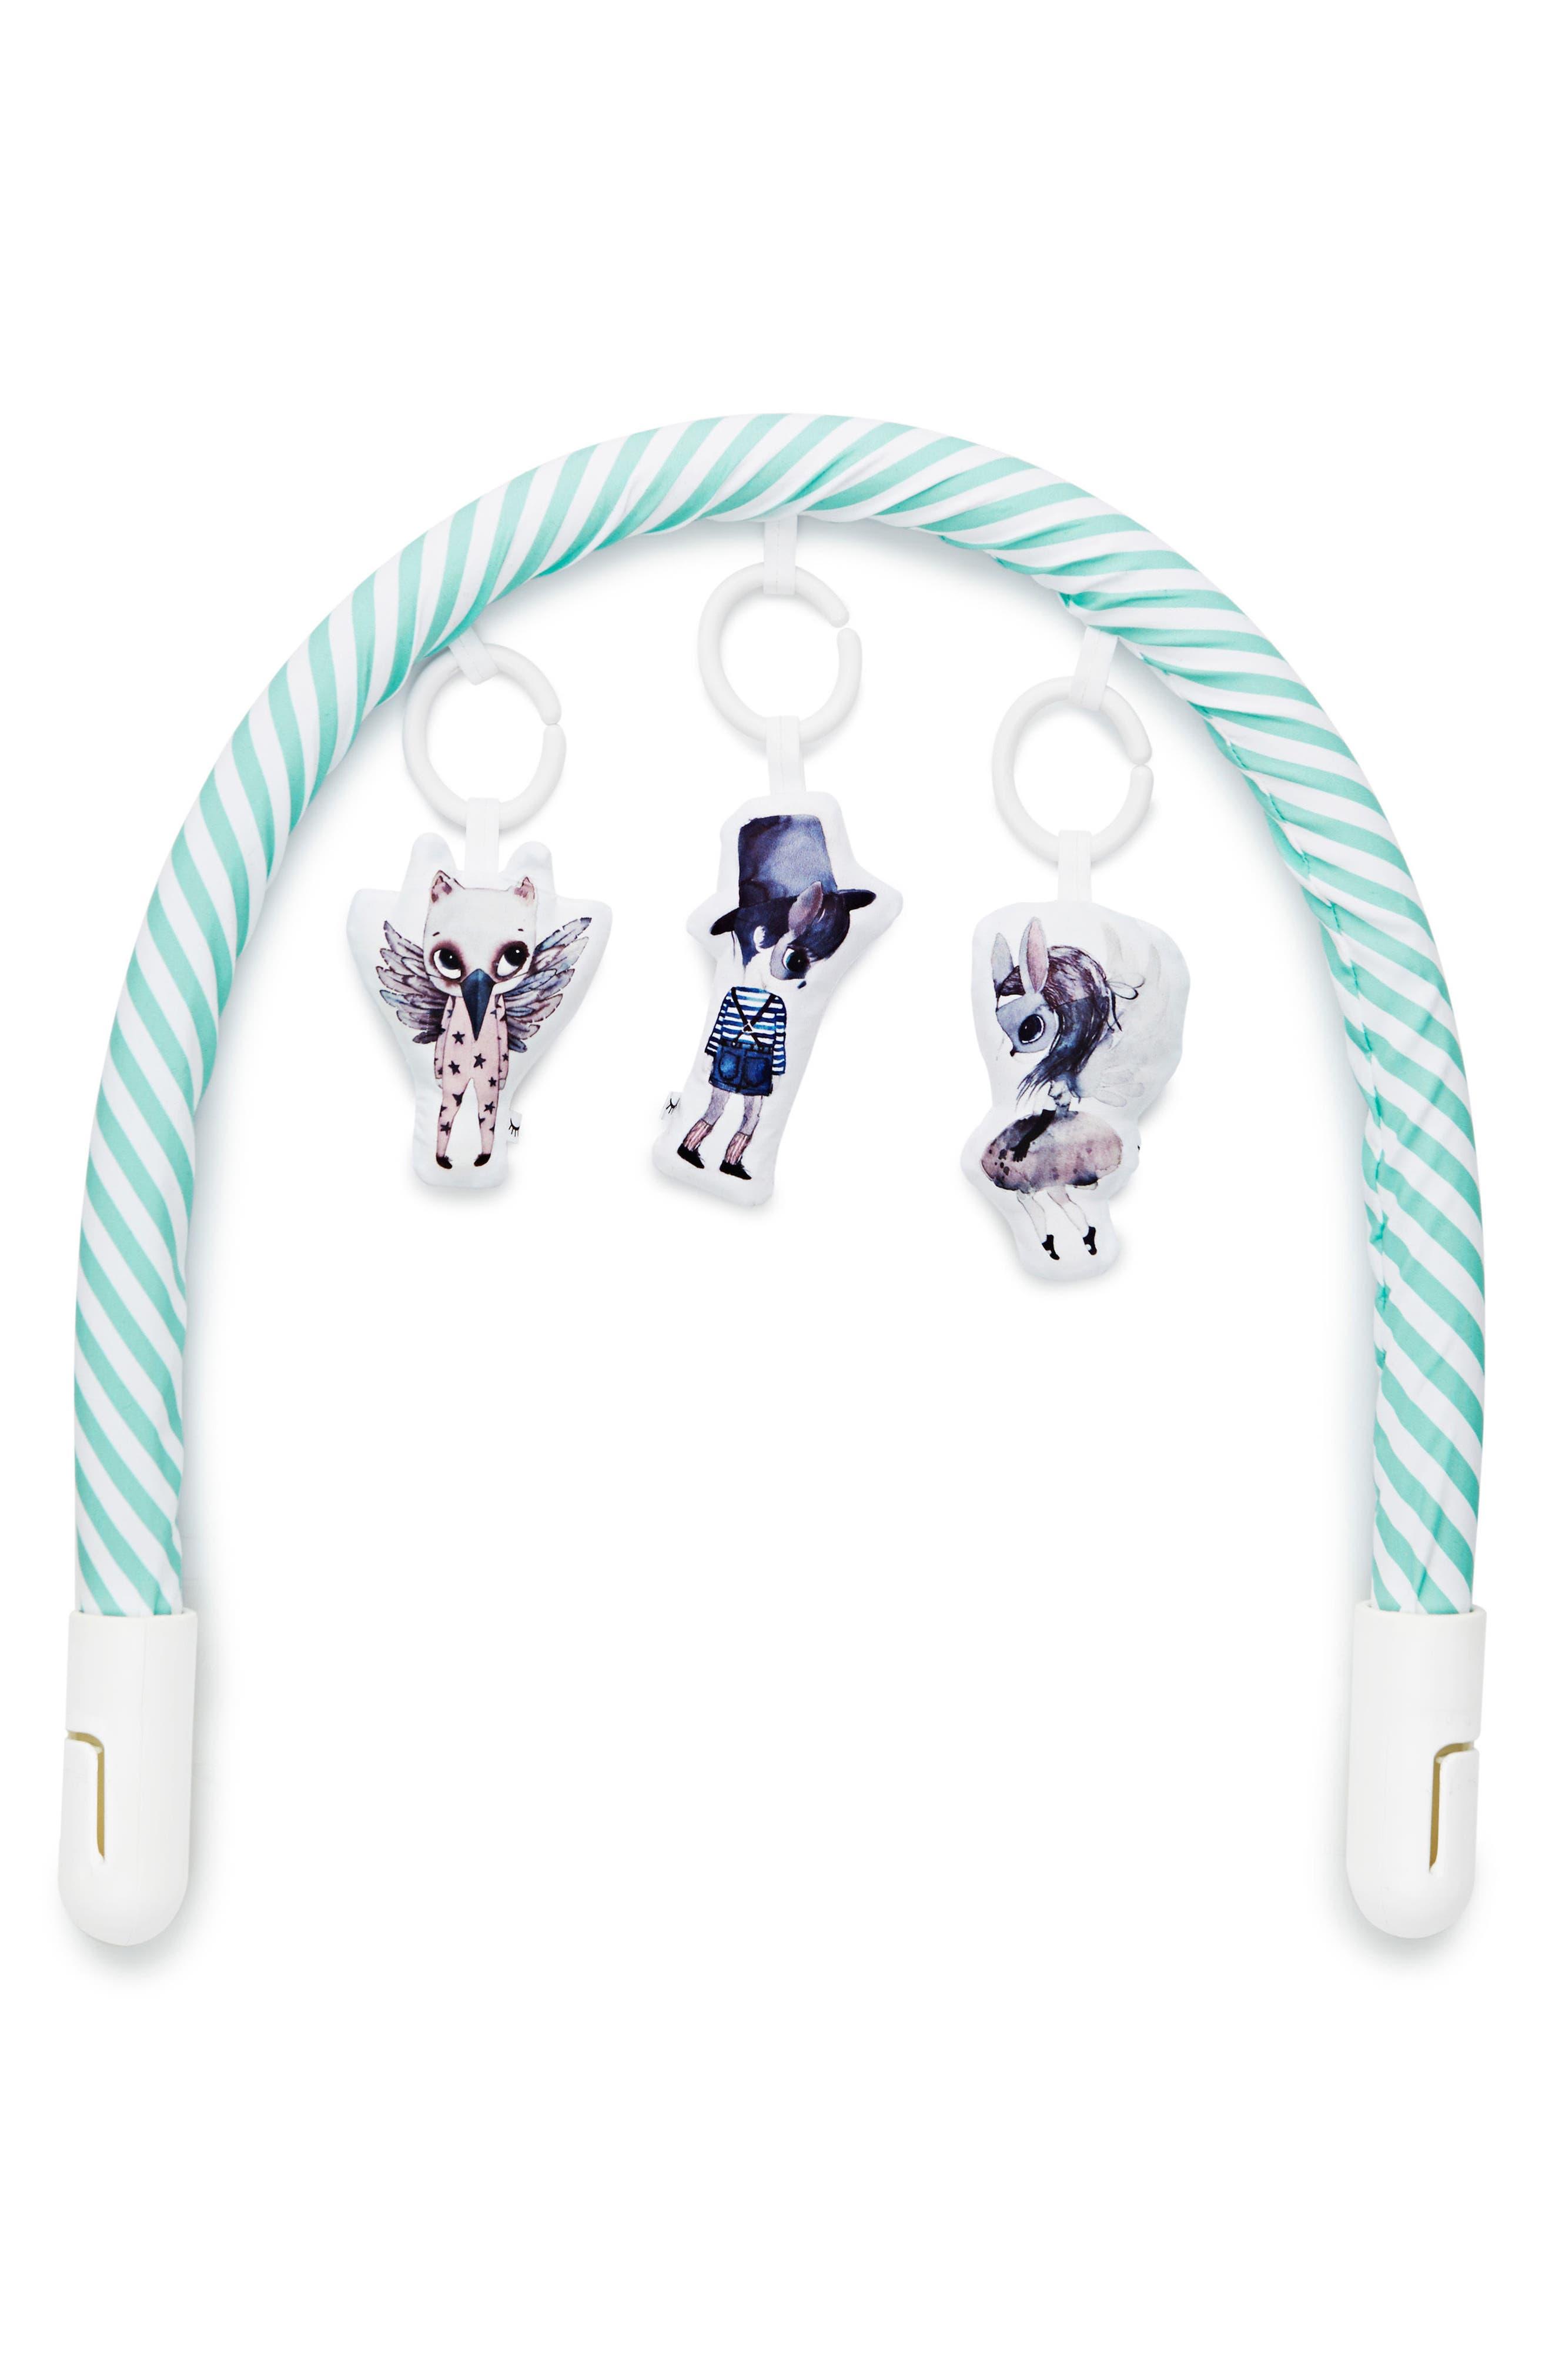 Toy Arch,                             Alternate thumbnail 3, color,                             Aqua/ White